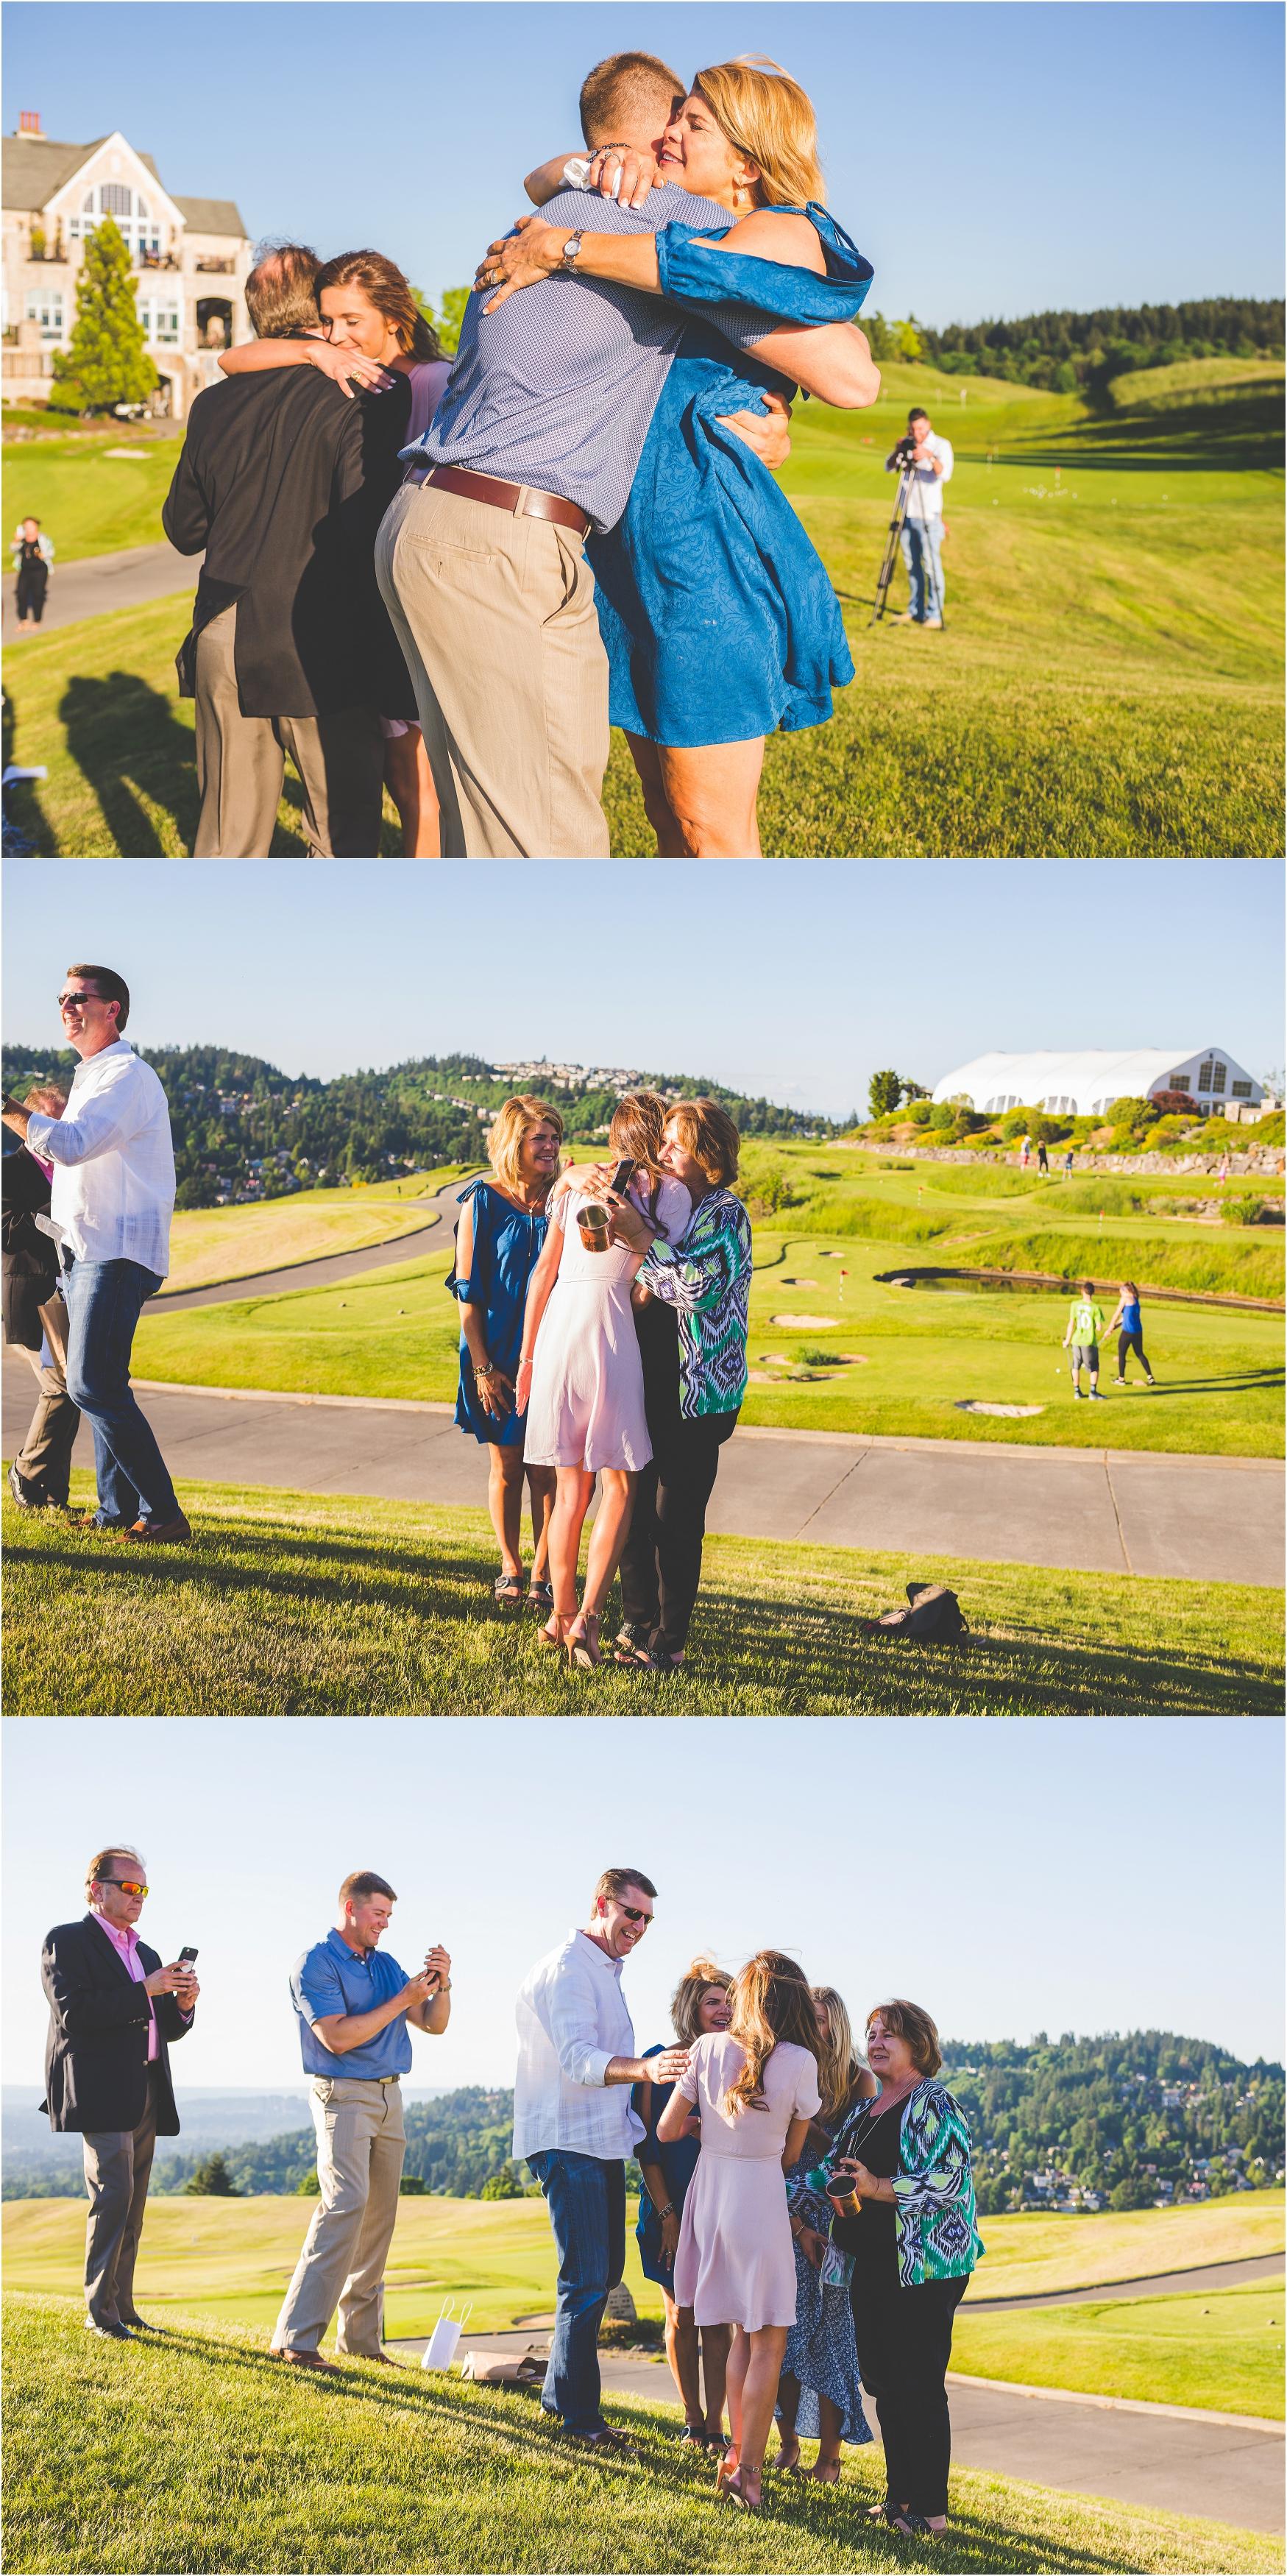 newcastle-golf-club-proposal-jannicka-mayte-seattle-washington-engagement-wedding-photographer_0013.jpg